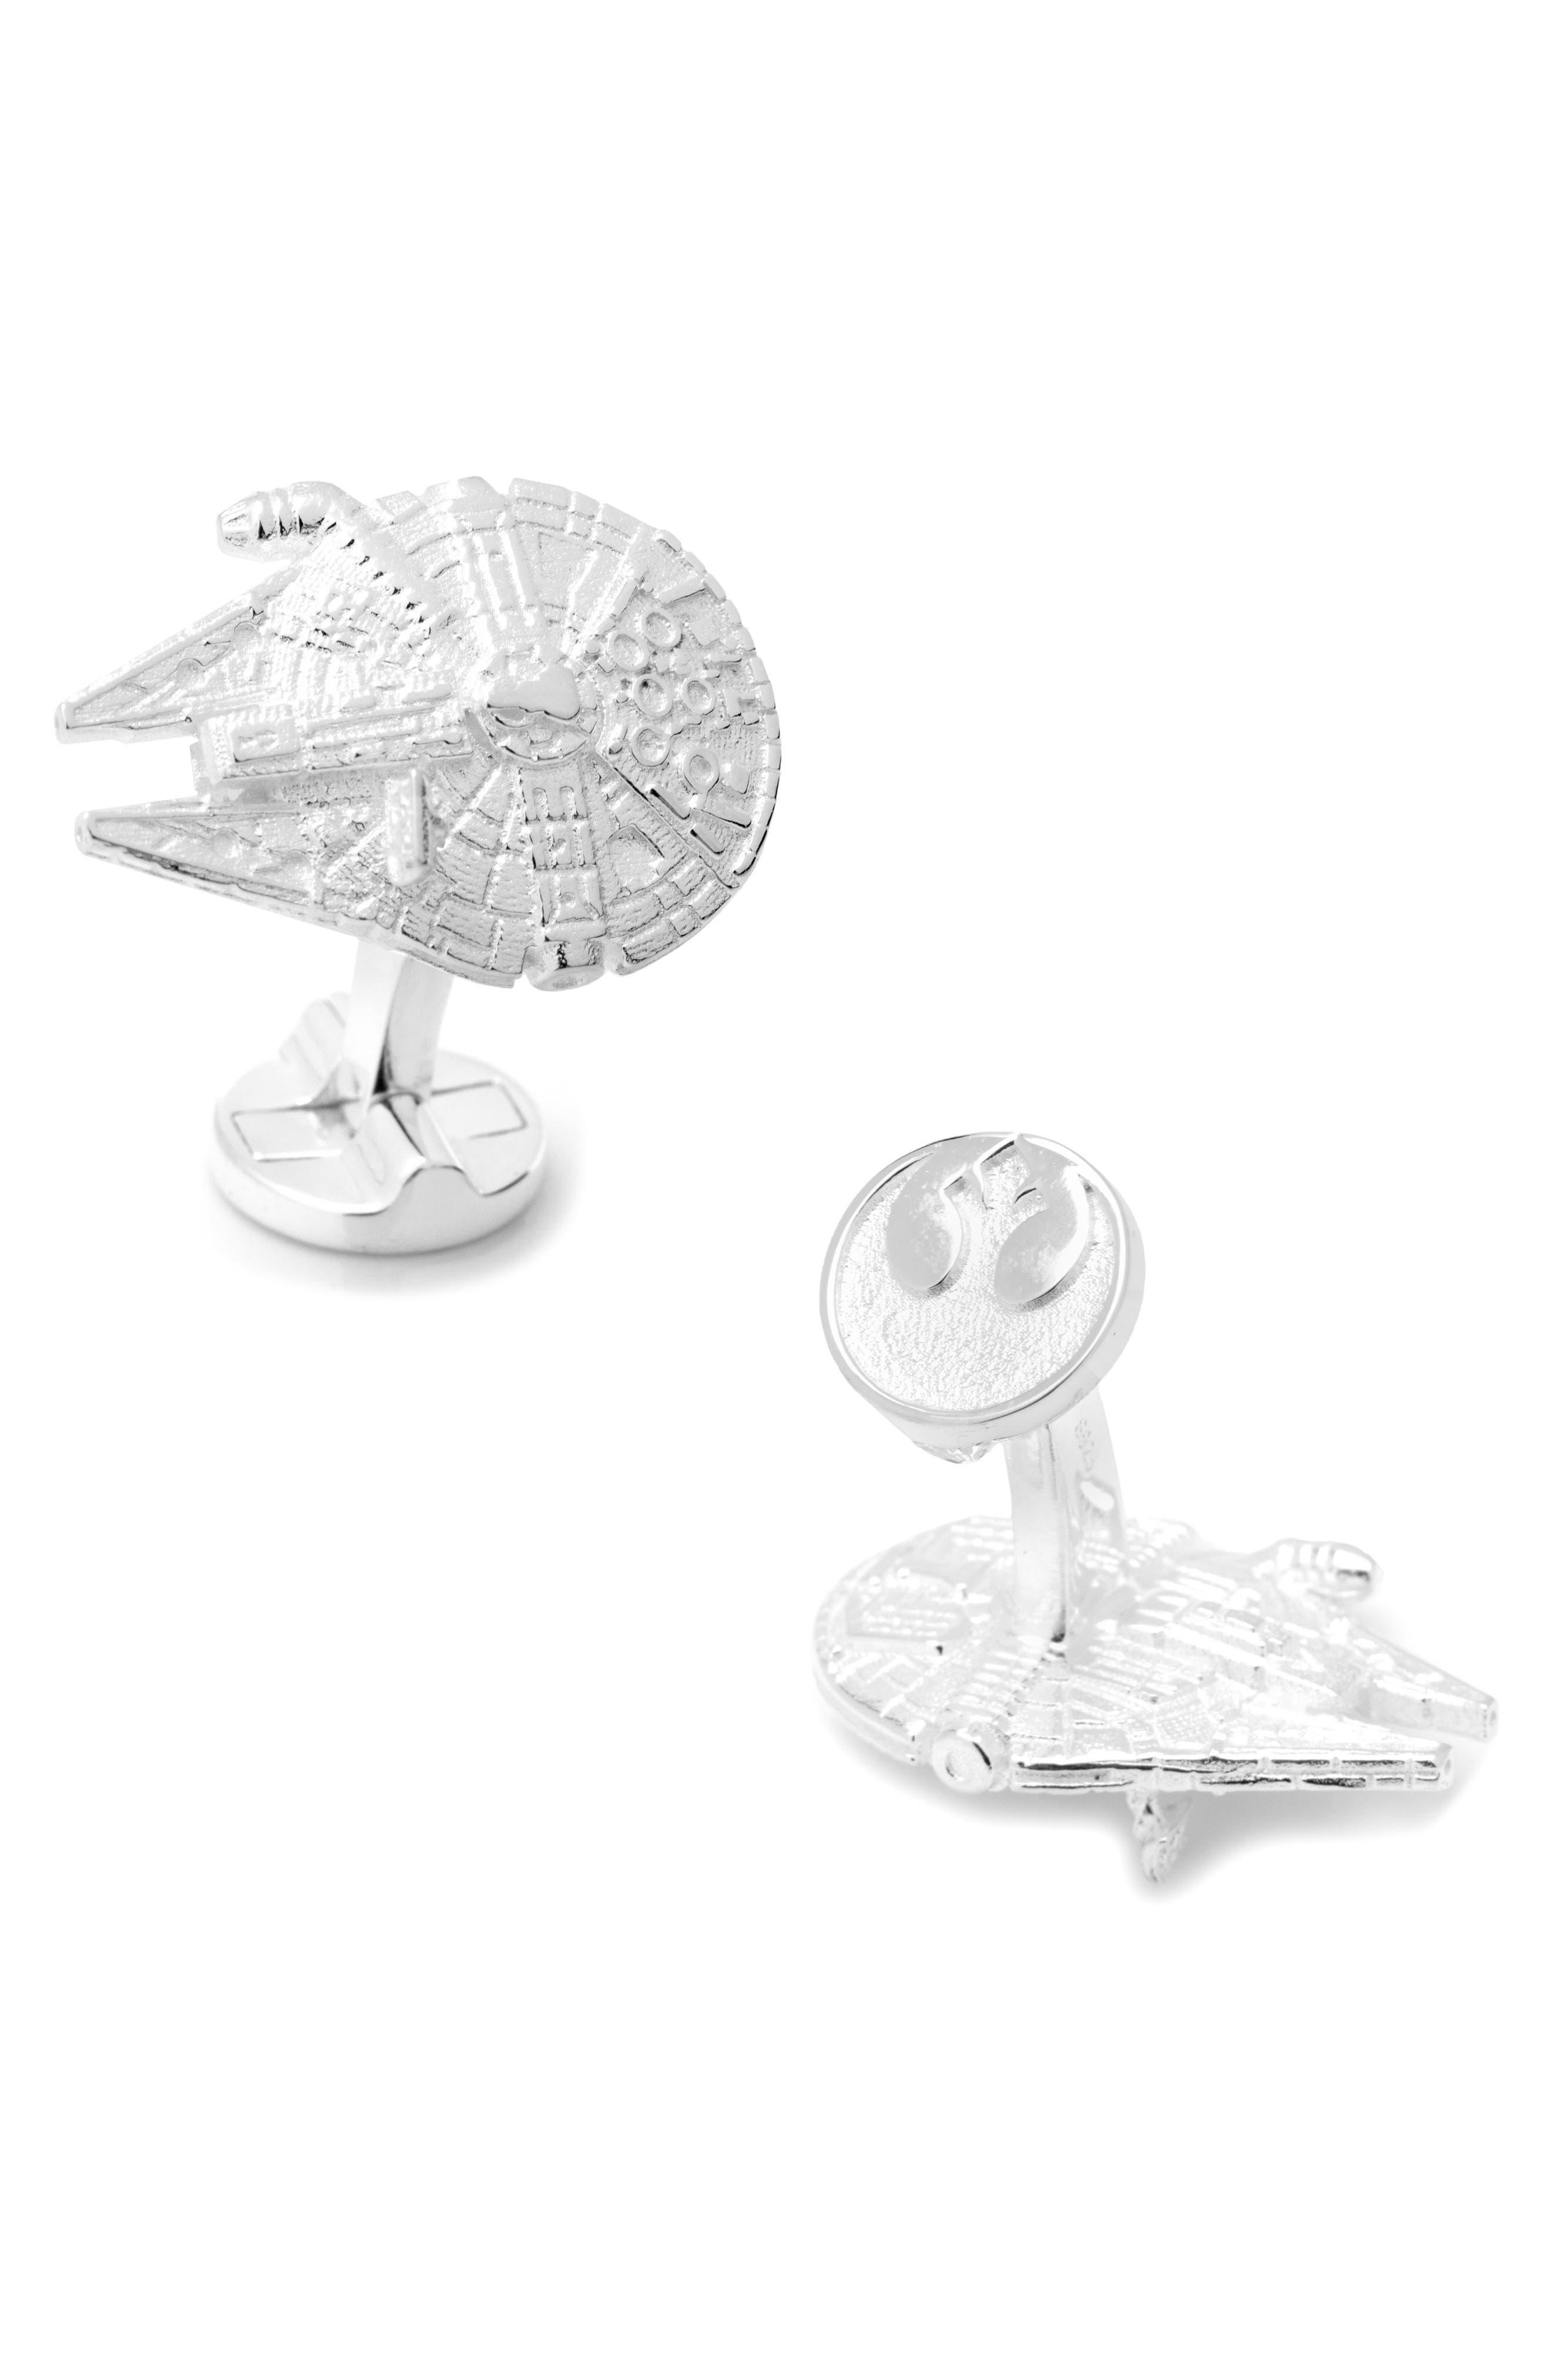 Star Wars<sup>™</sup> Millennium Falcon Cuff Links,                             Main thumbnail 1, color,                             SILVER